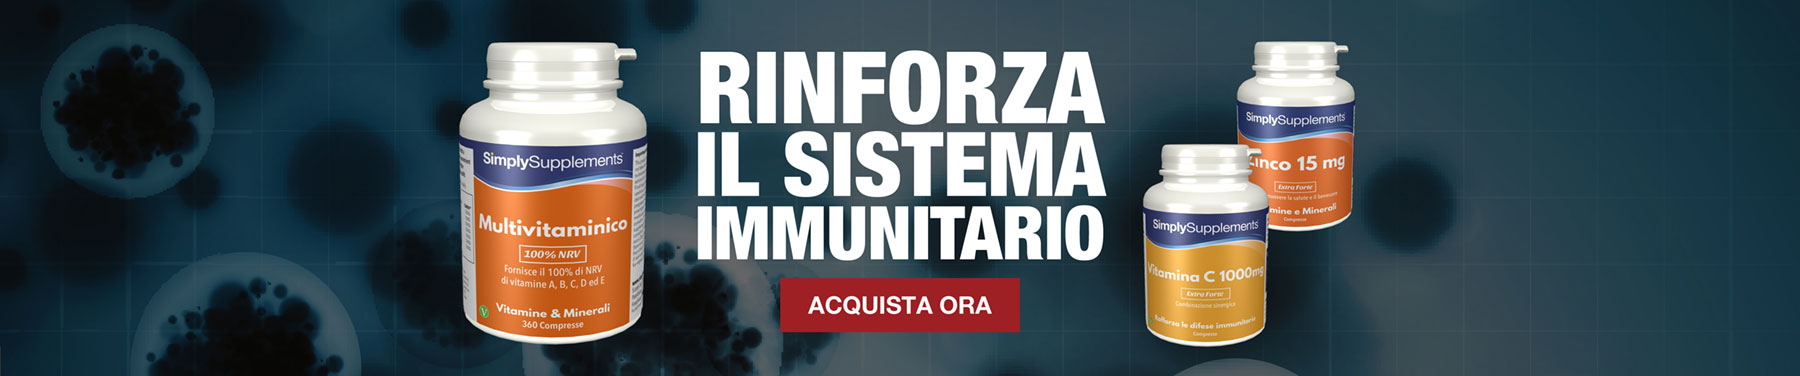 RINFORZAIL SISTEMA IMMUNITARIO